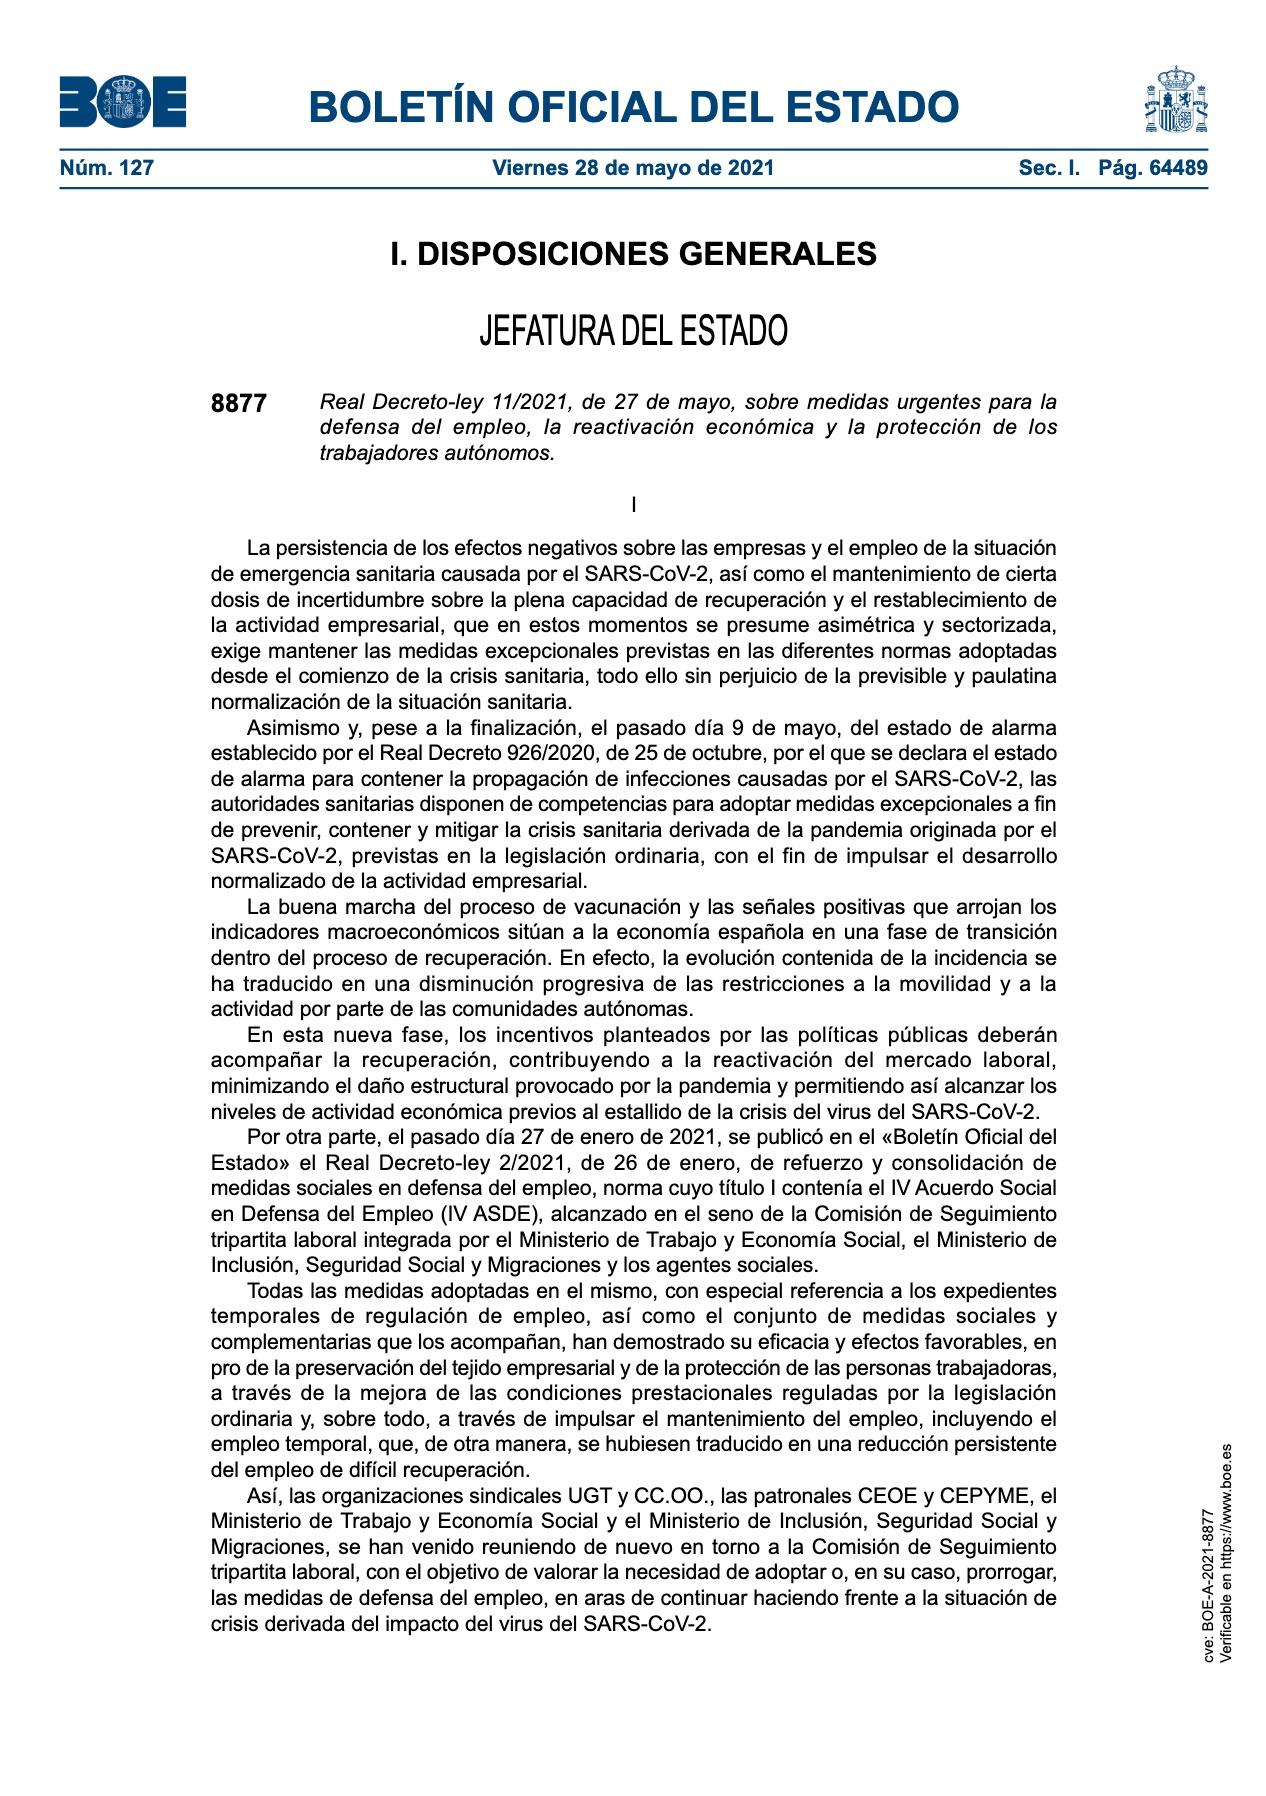 210602 ART WEB PUBLICADO EL REAL DECRETO LEY SOBRE MEDIDAS URGENTES PARA LA DEFENSA DEL EMPLEO